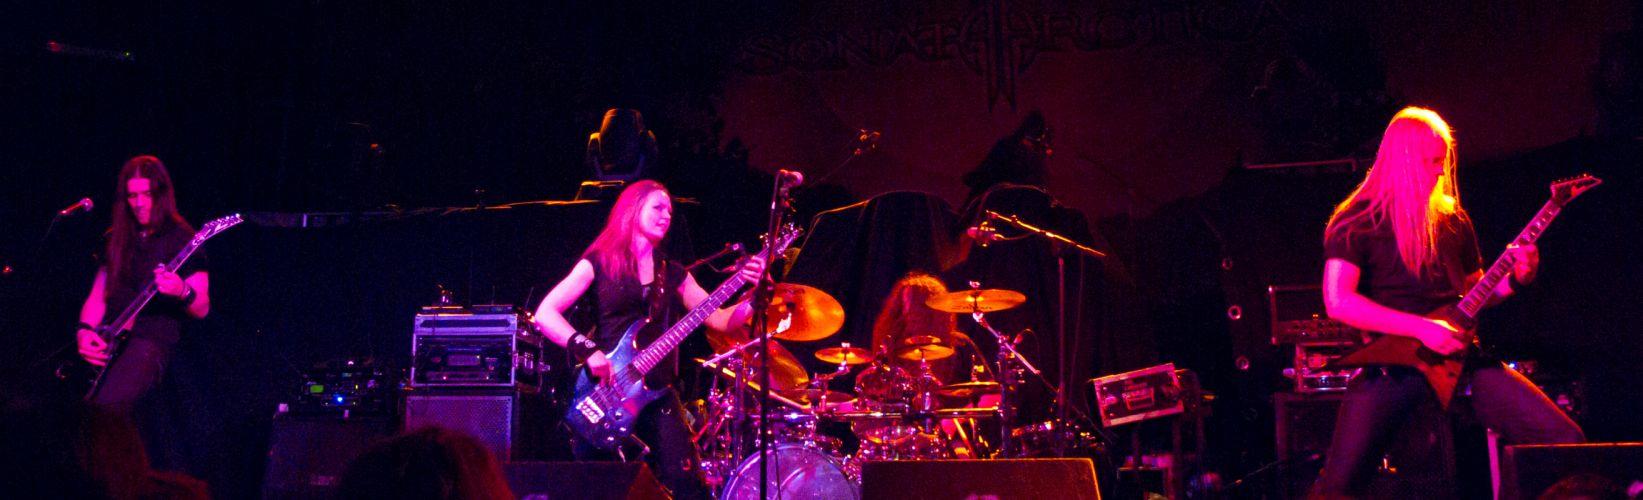 Triosphere heavy metal concert guitar drums fw wallpaper